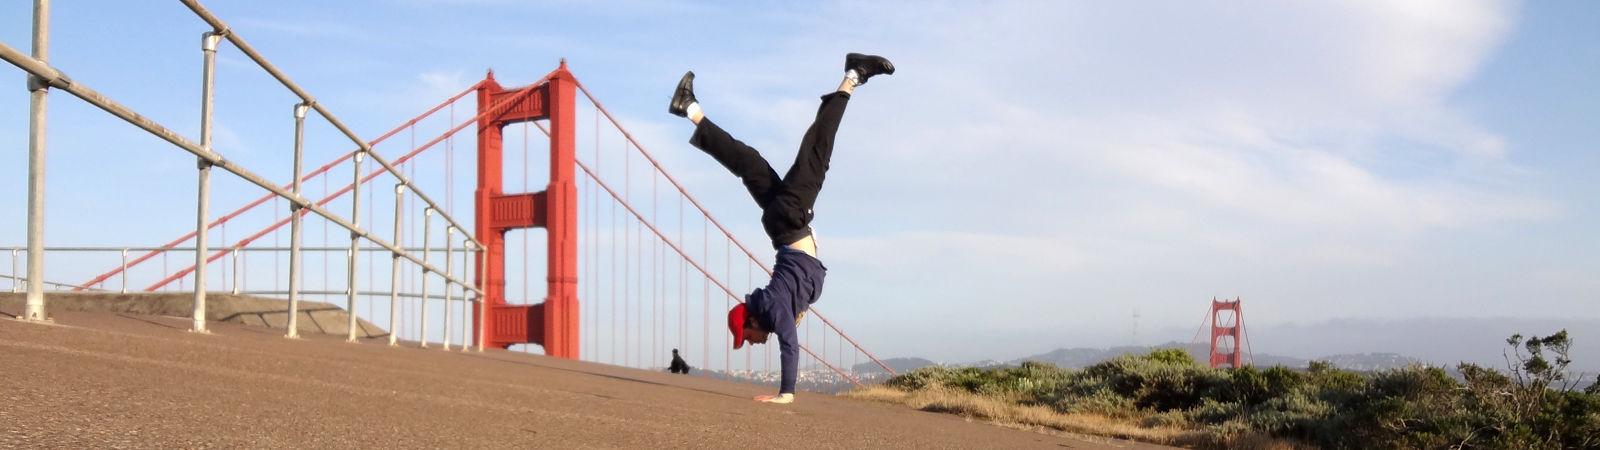 HotelKabuki_Fitness_Stock_Handstand